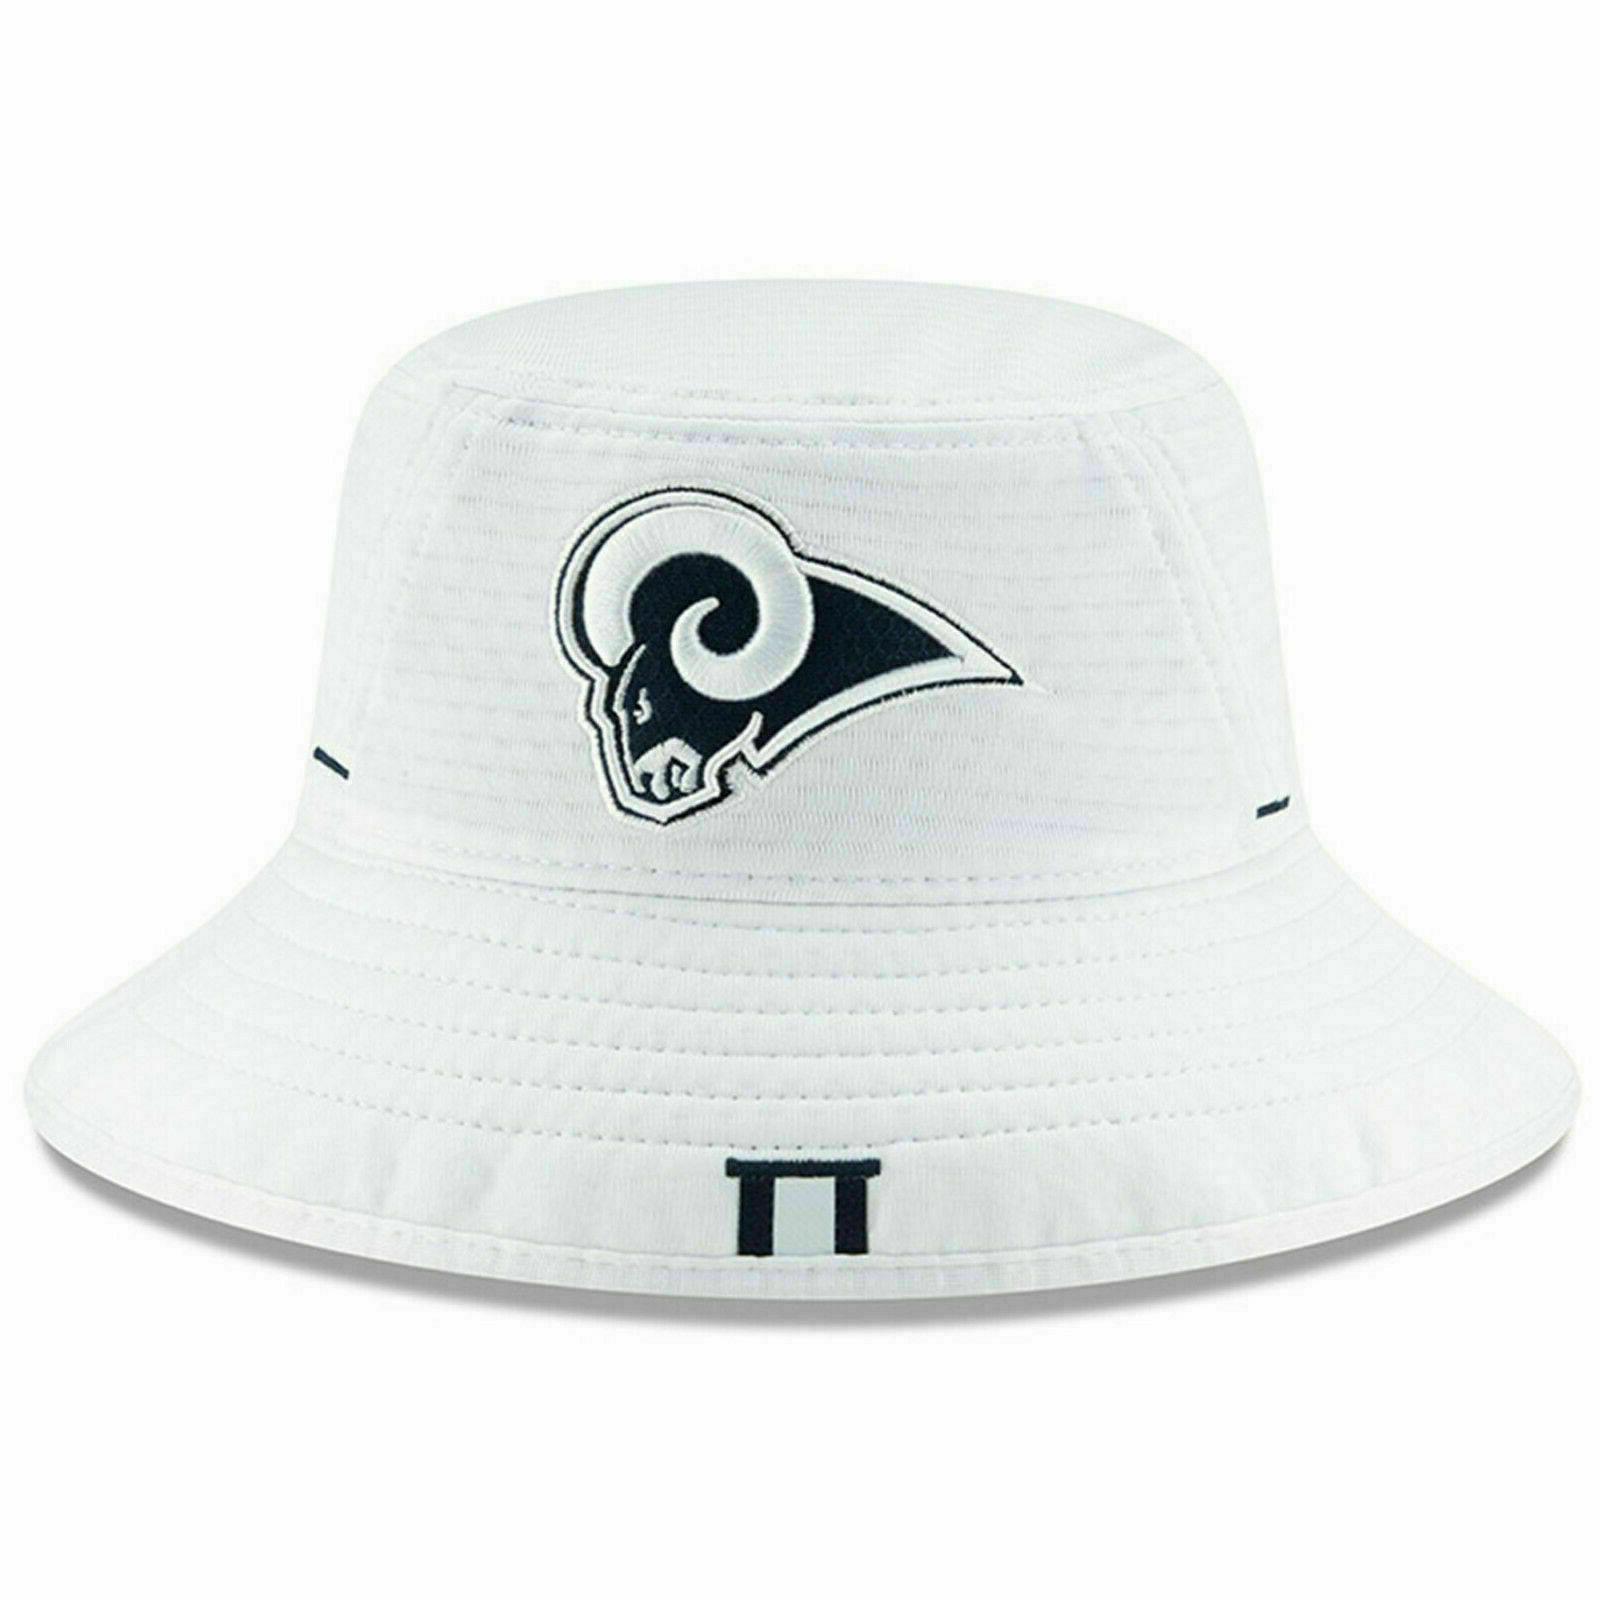 los angeles rams bucket hat white 2019